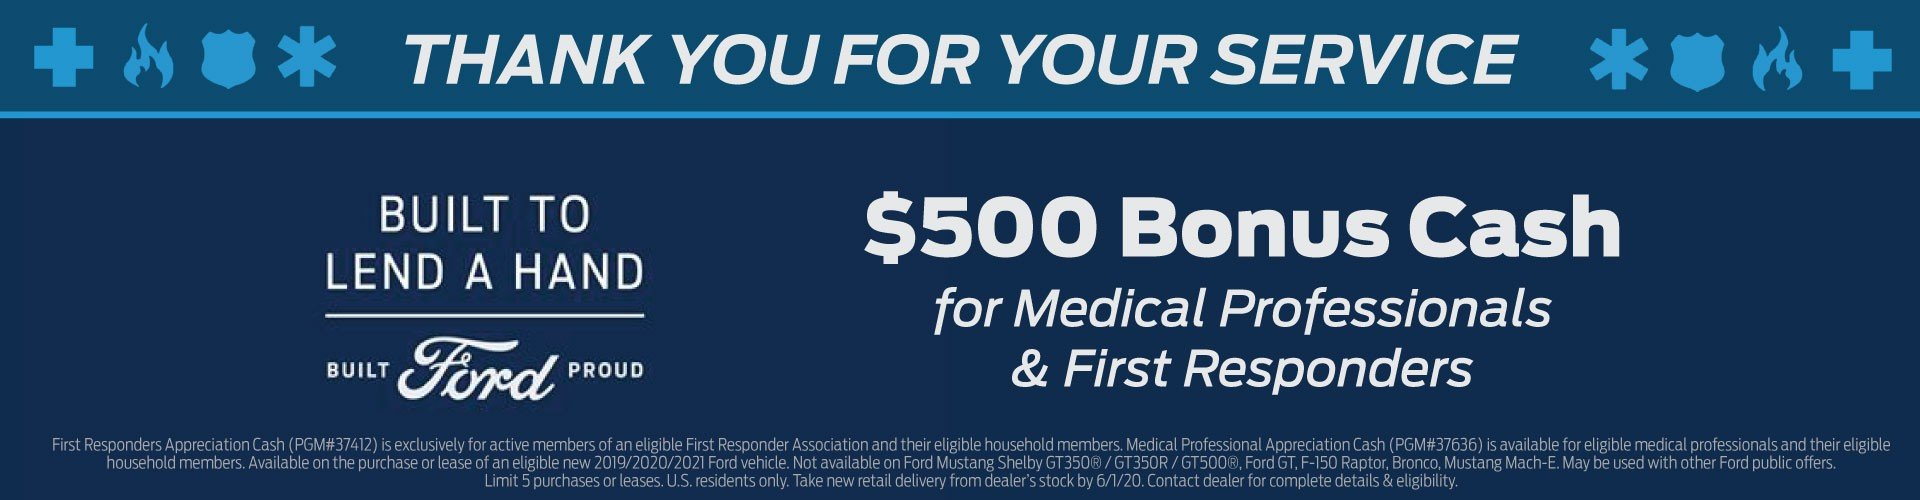 Medical Professional and First Responder Bonus Cash 6-1-2020